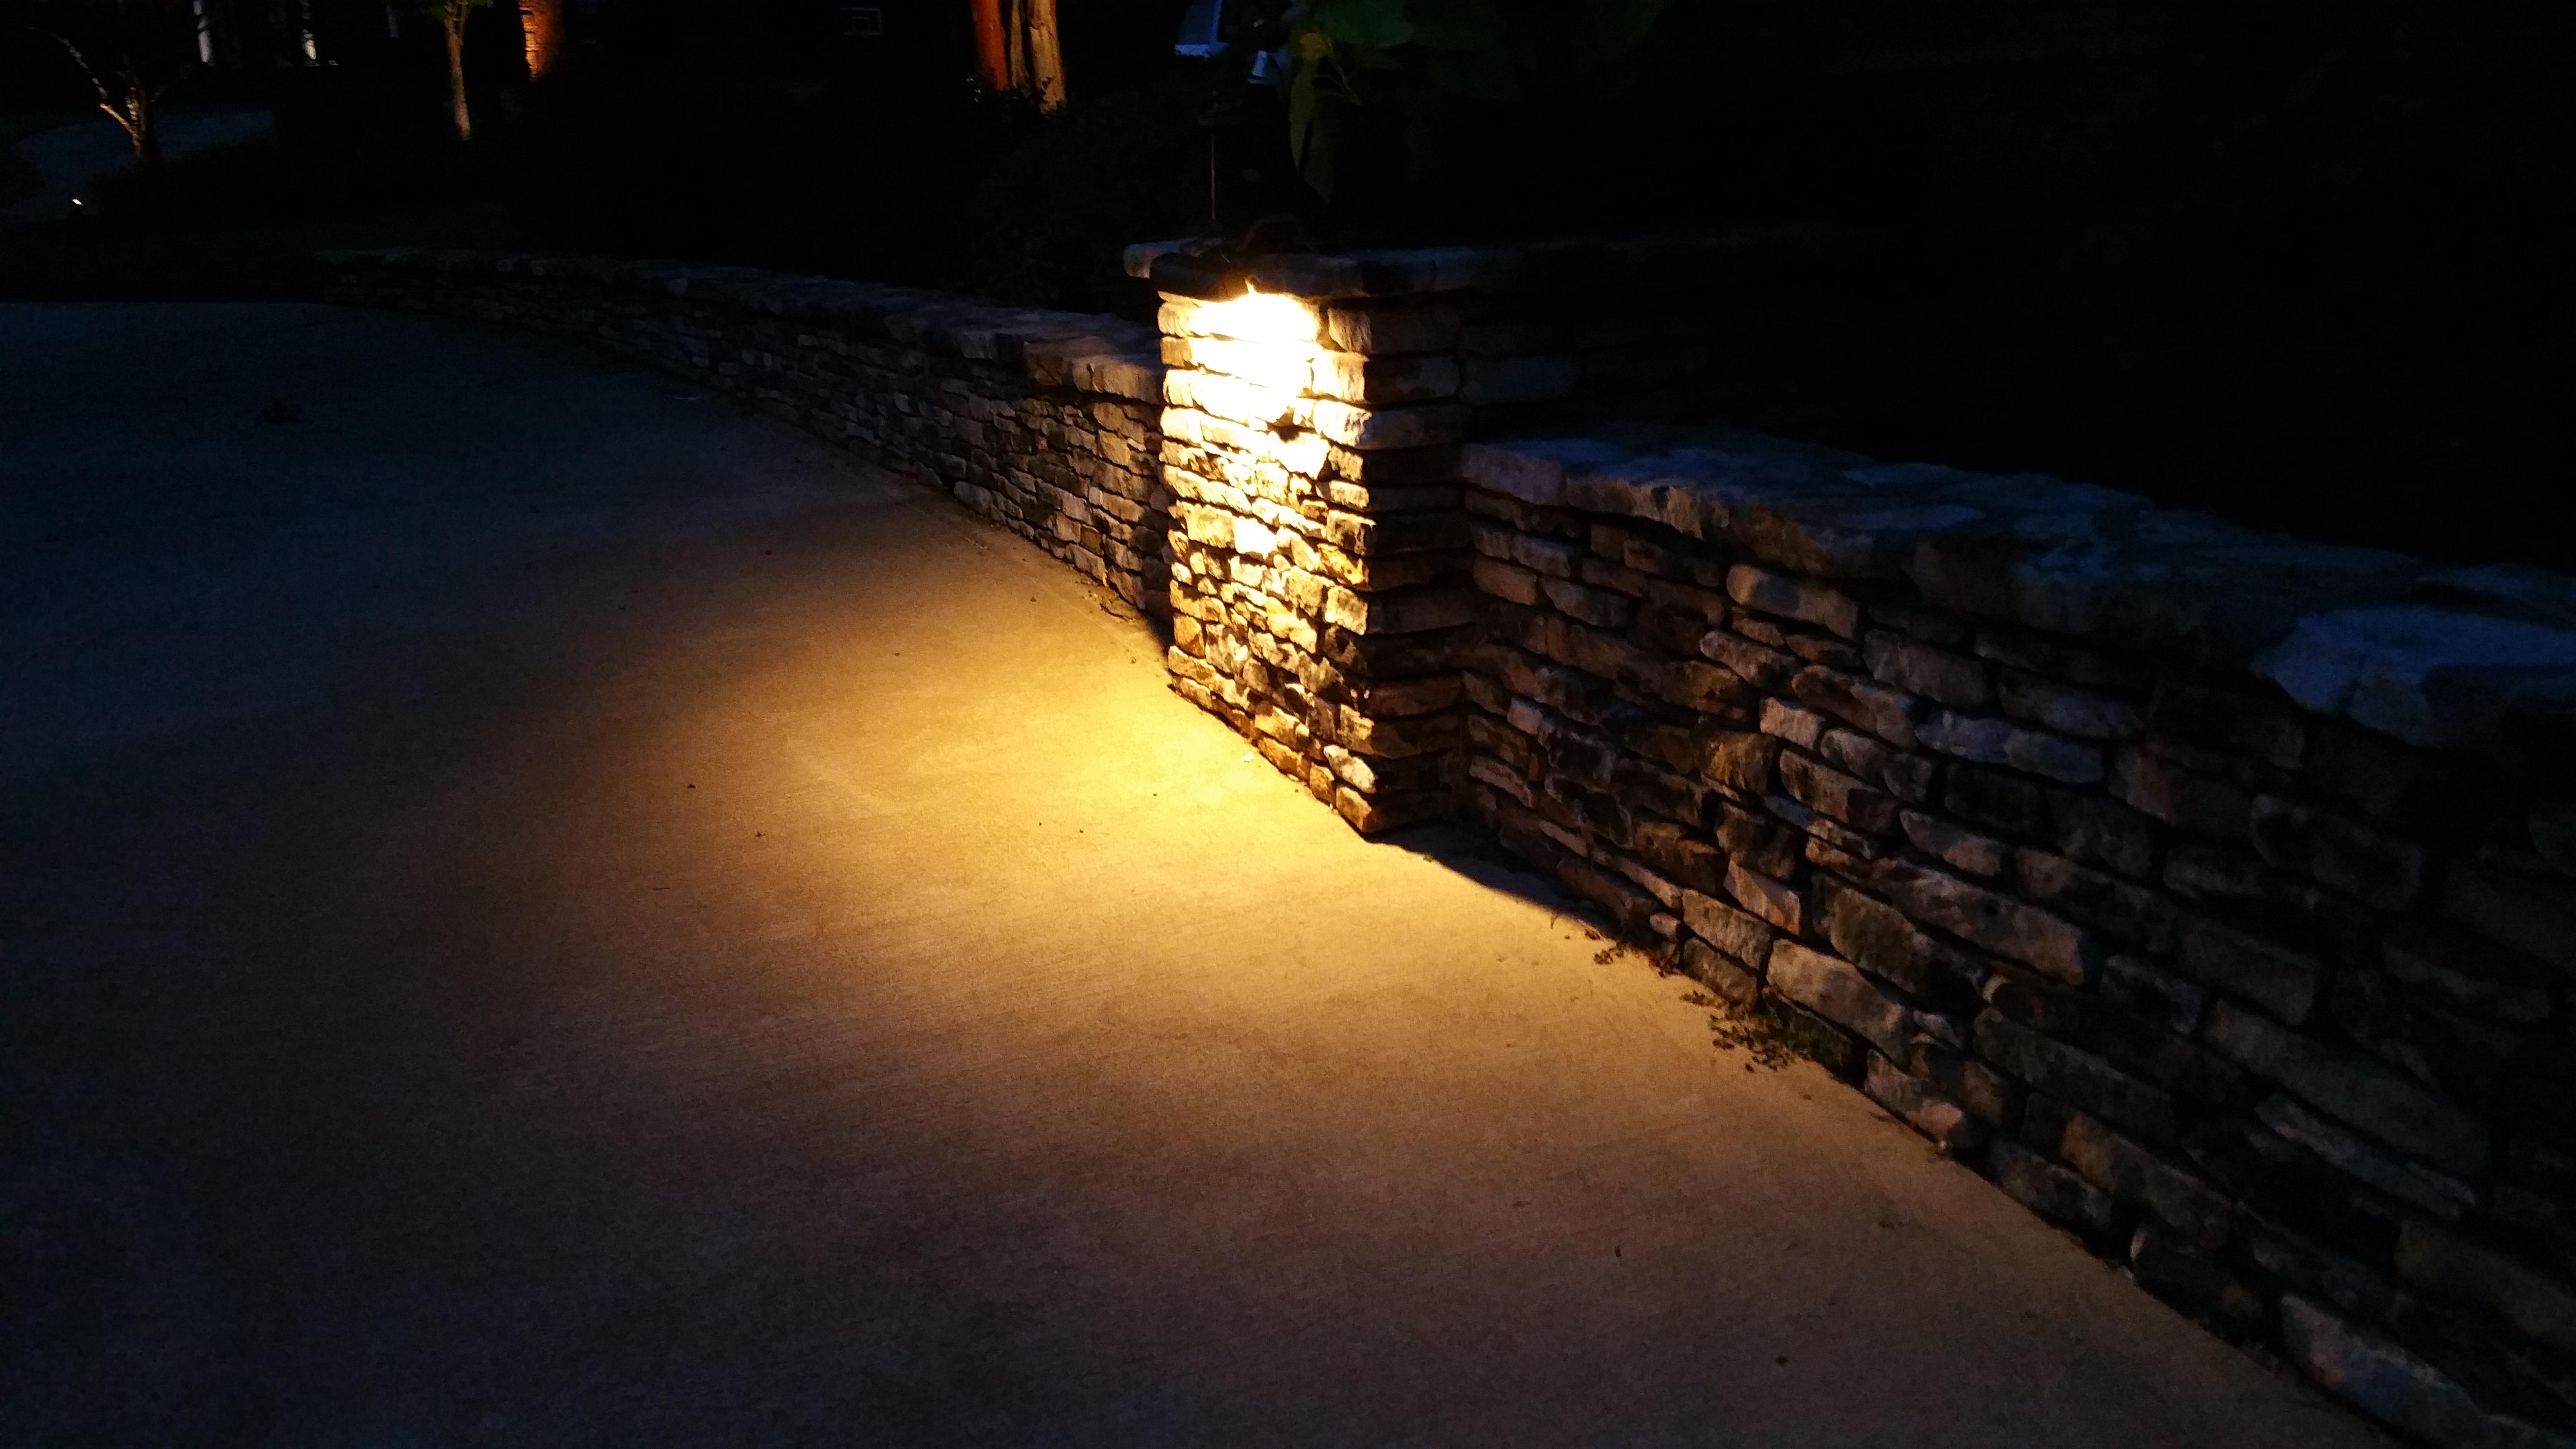 Stacked stone natural stone pavers seattle outdoor lighting to stacked stone natural stone pavers seattle outdoor lighting to showcase your custom stone work aloadofball Gallery